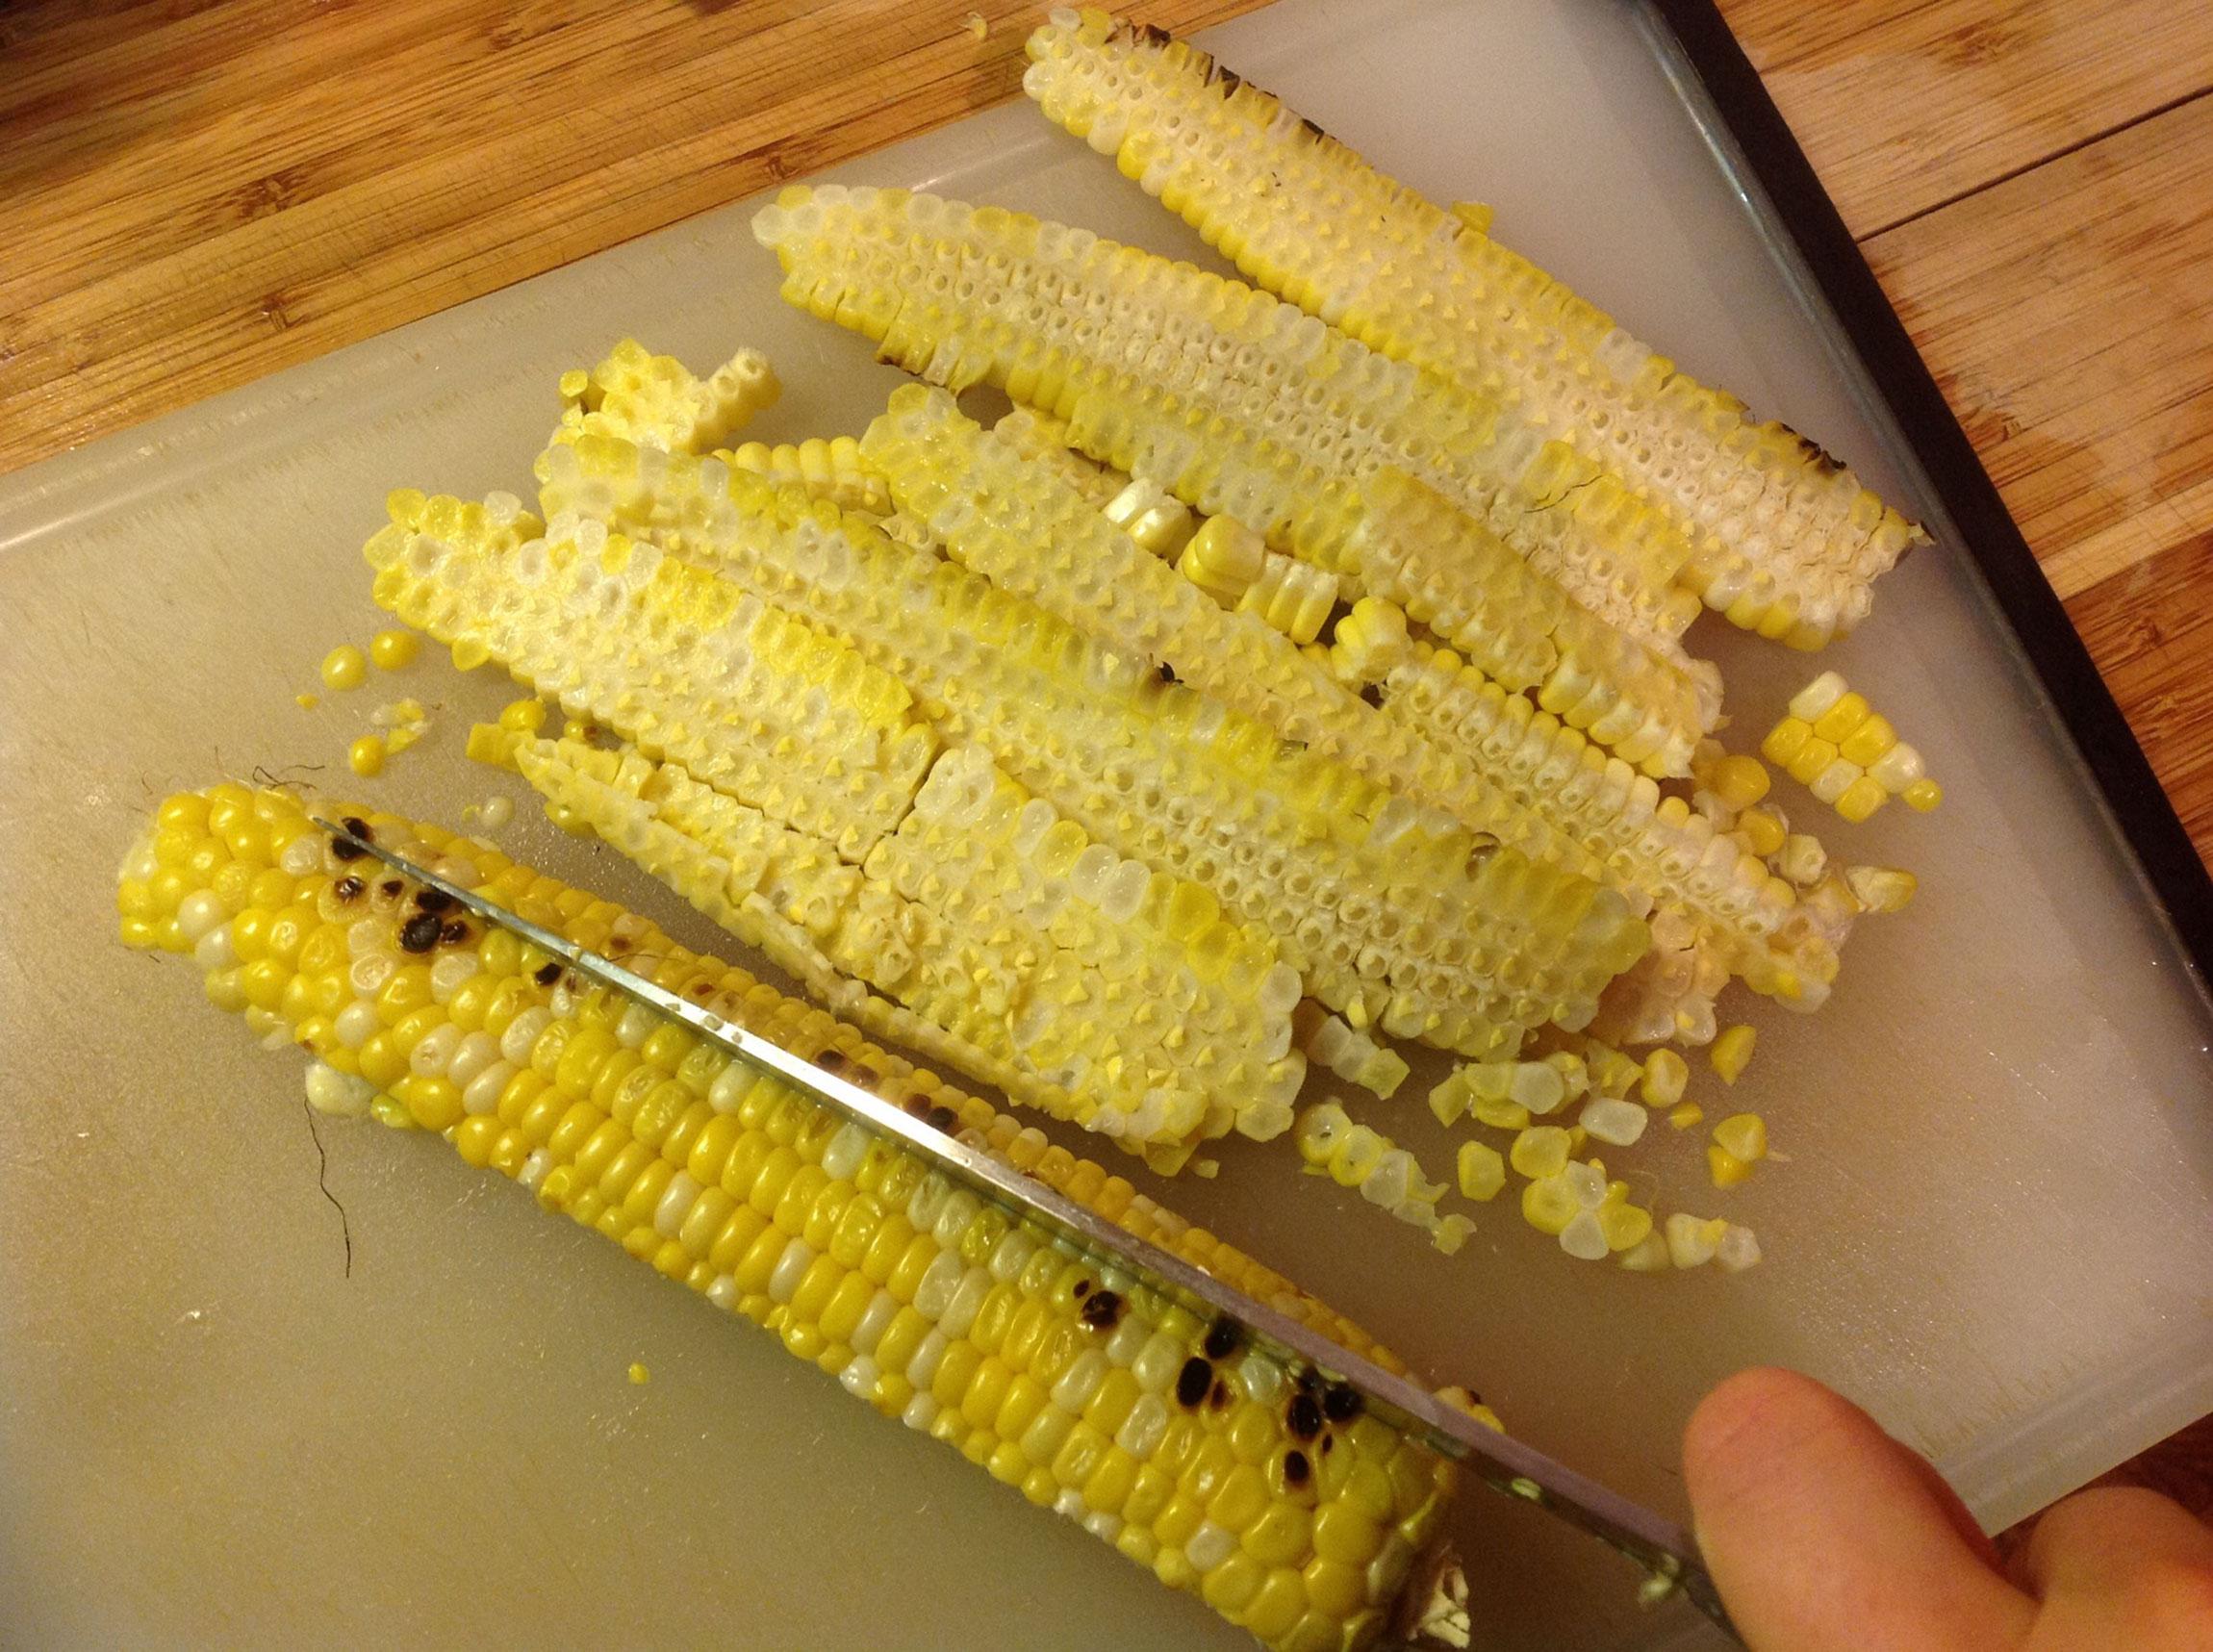 grilled corn being cut on cutting board